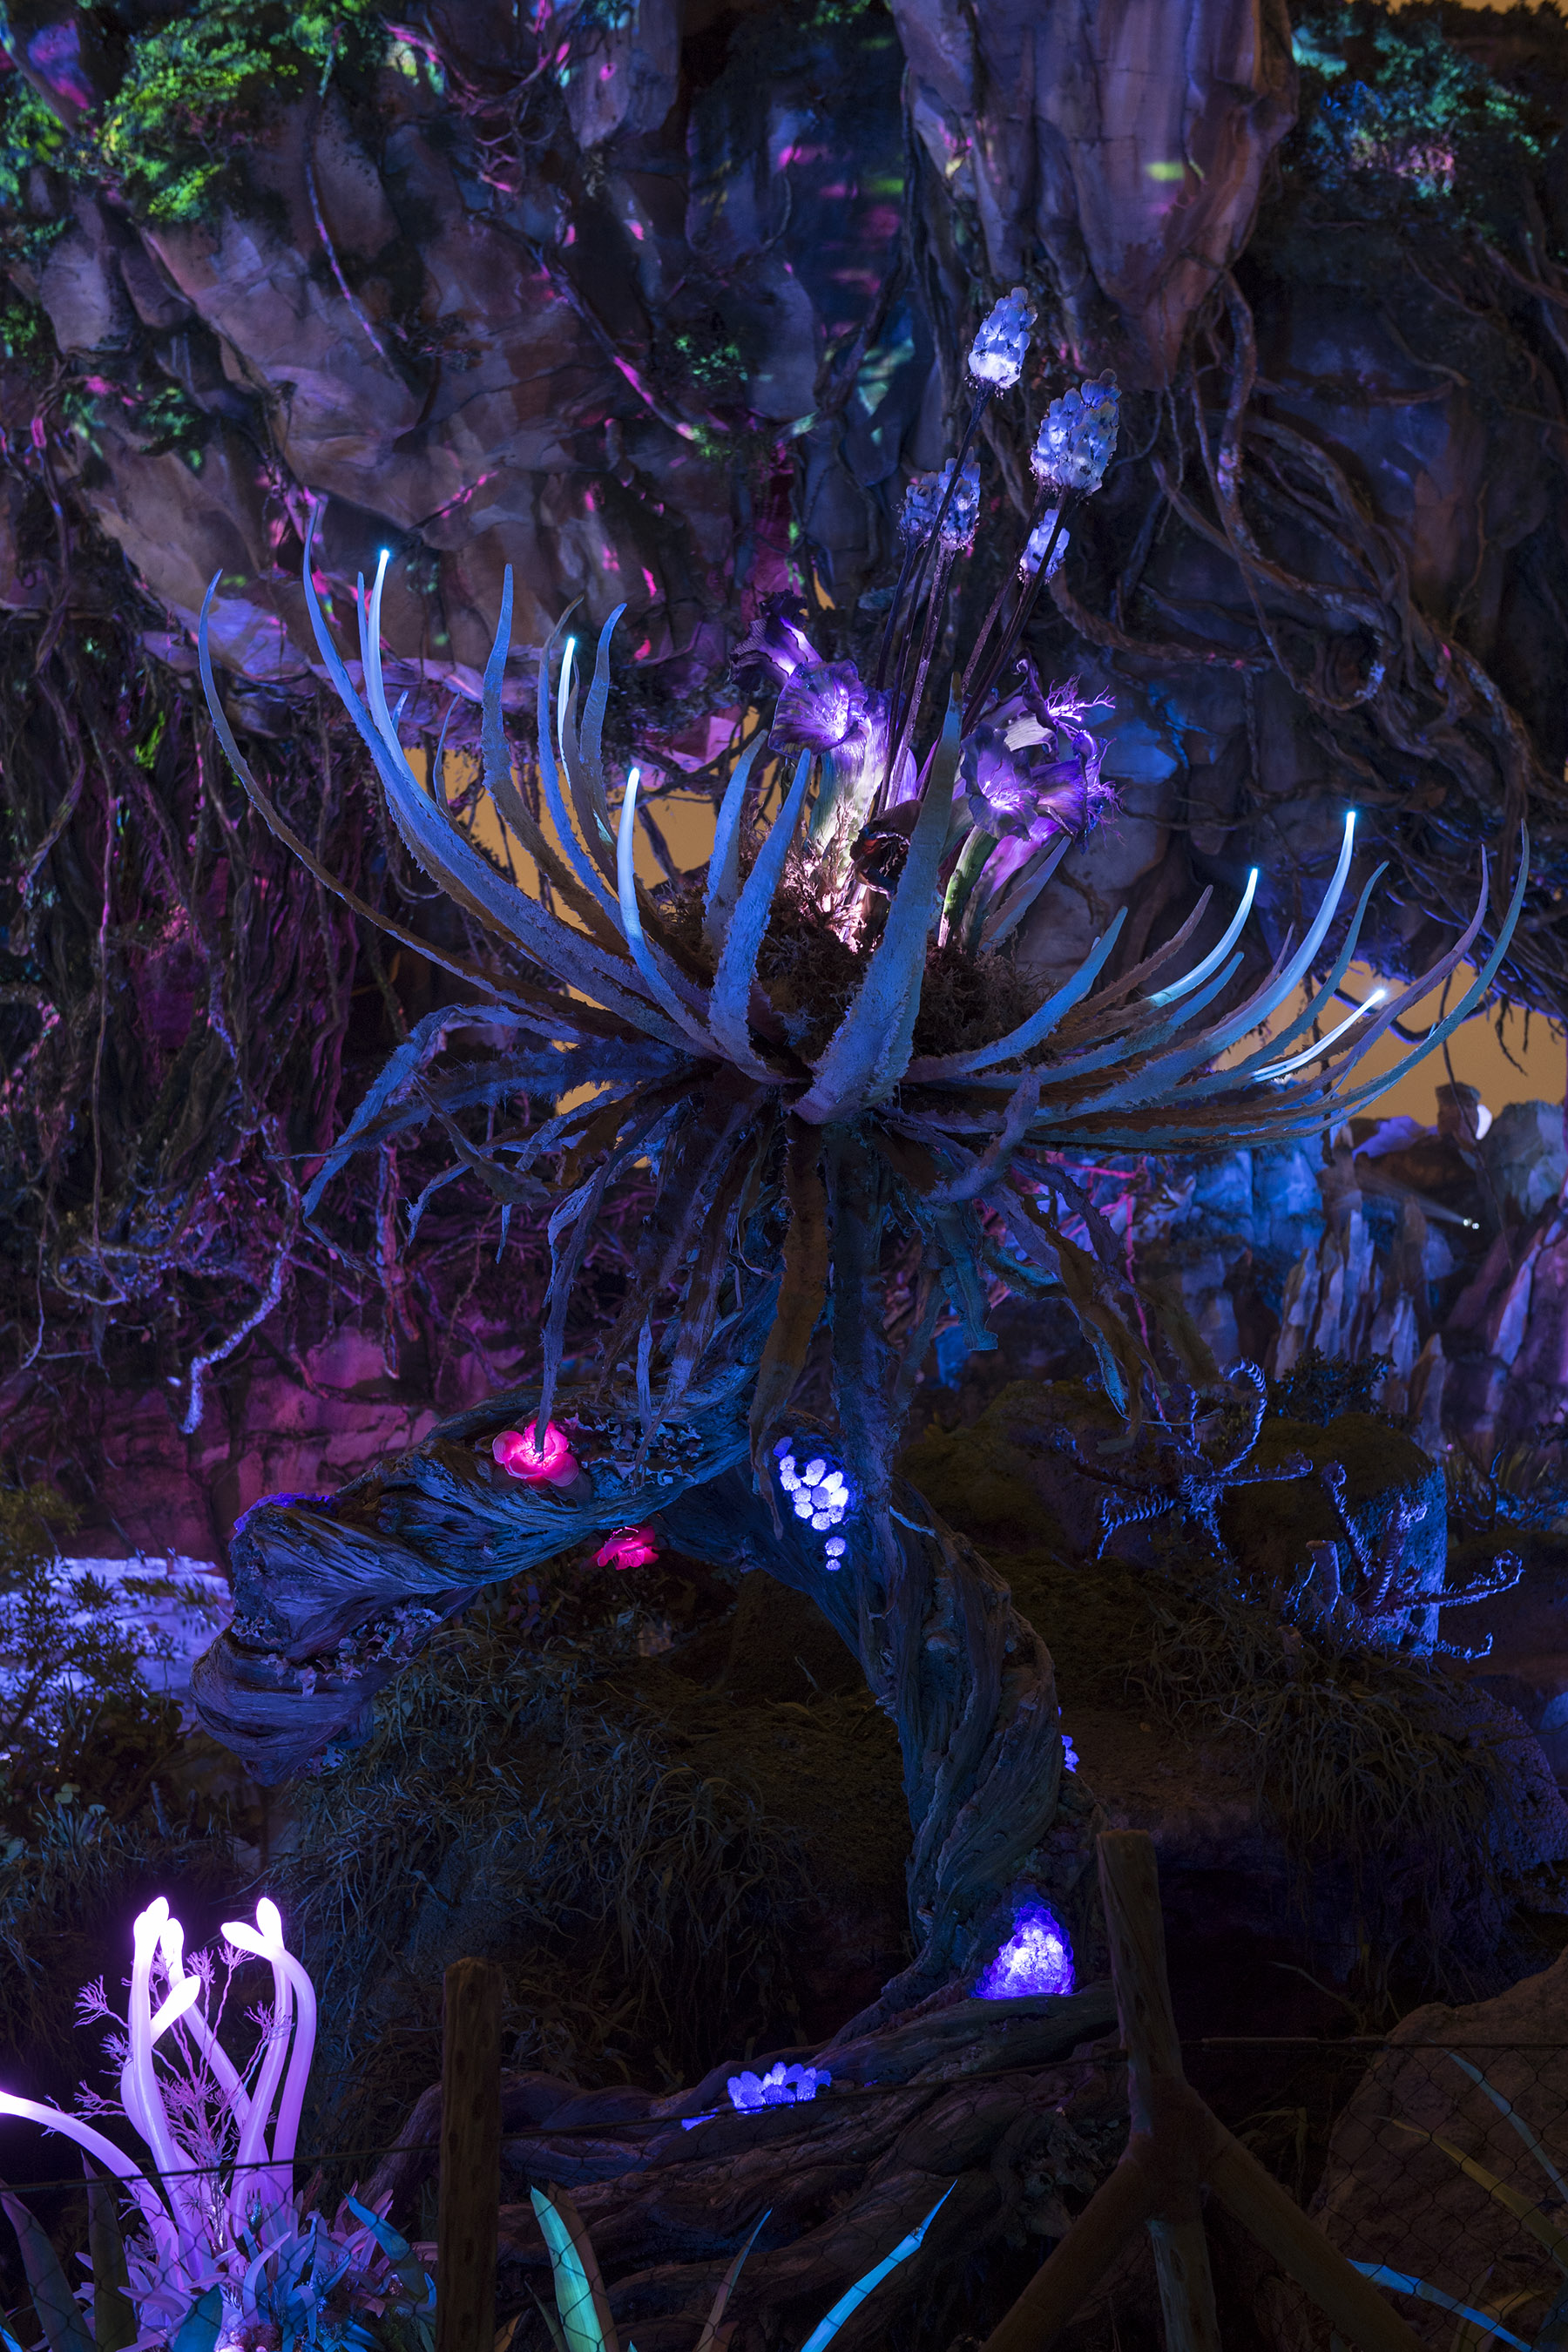 Bioluminescent plants. (Photo credit: Disney)